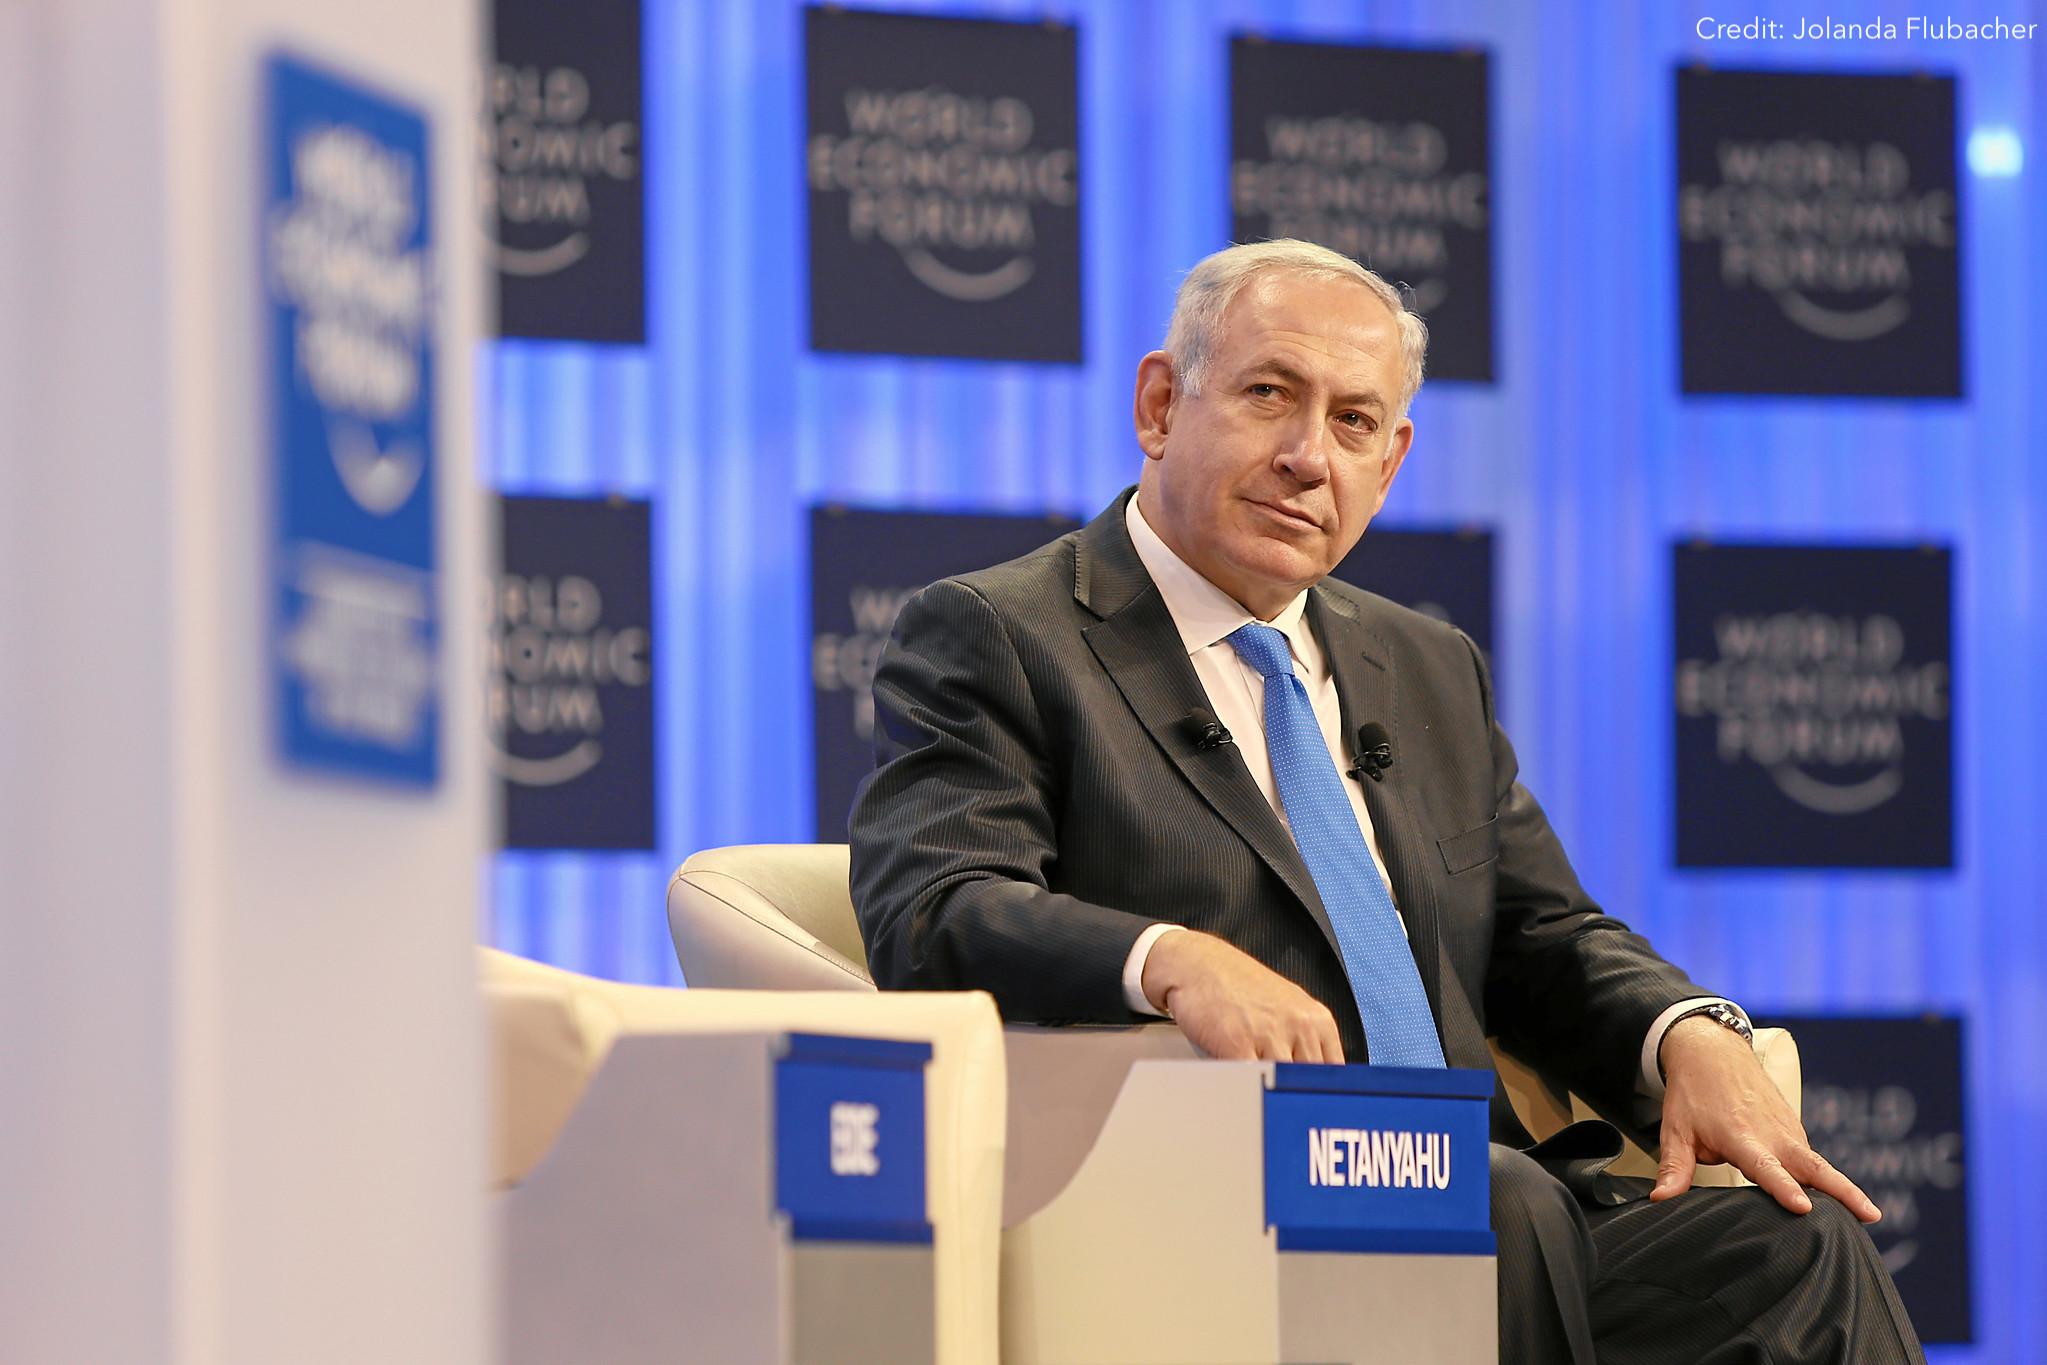 netanyahu palestine israel